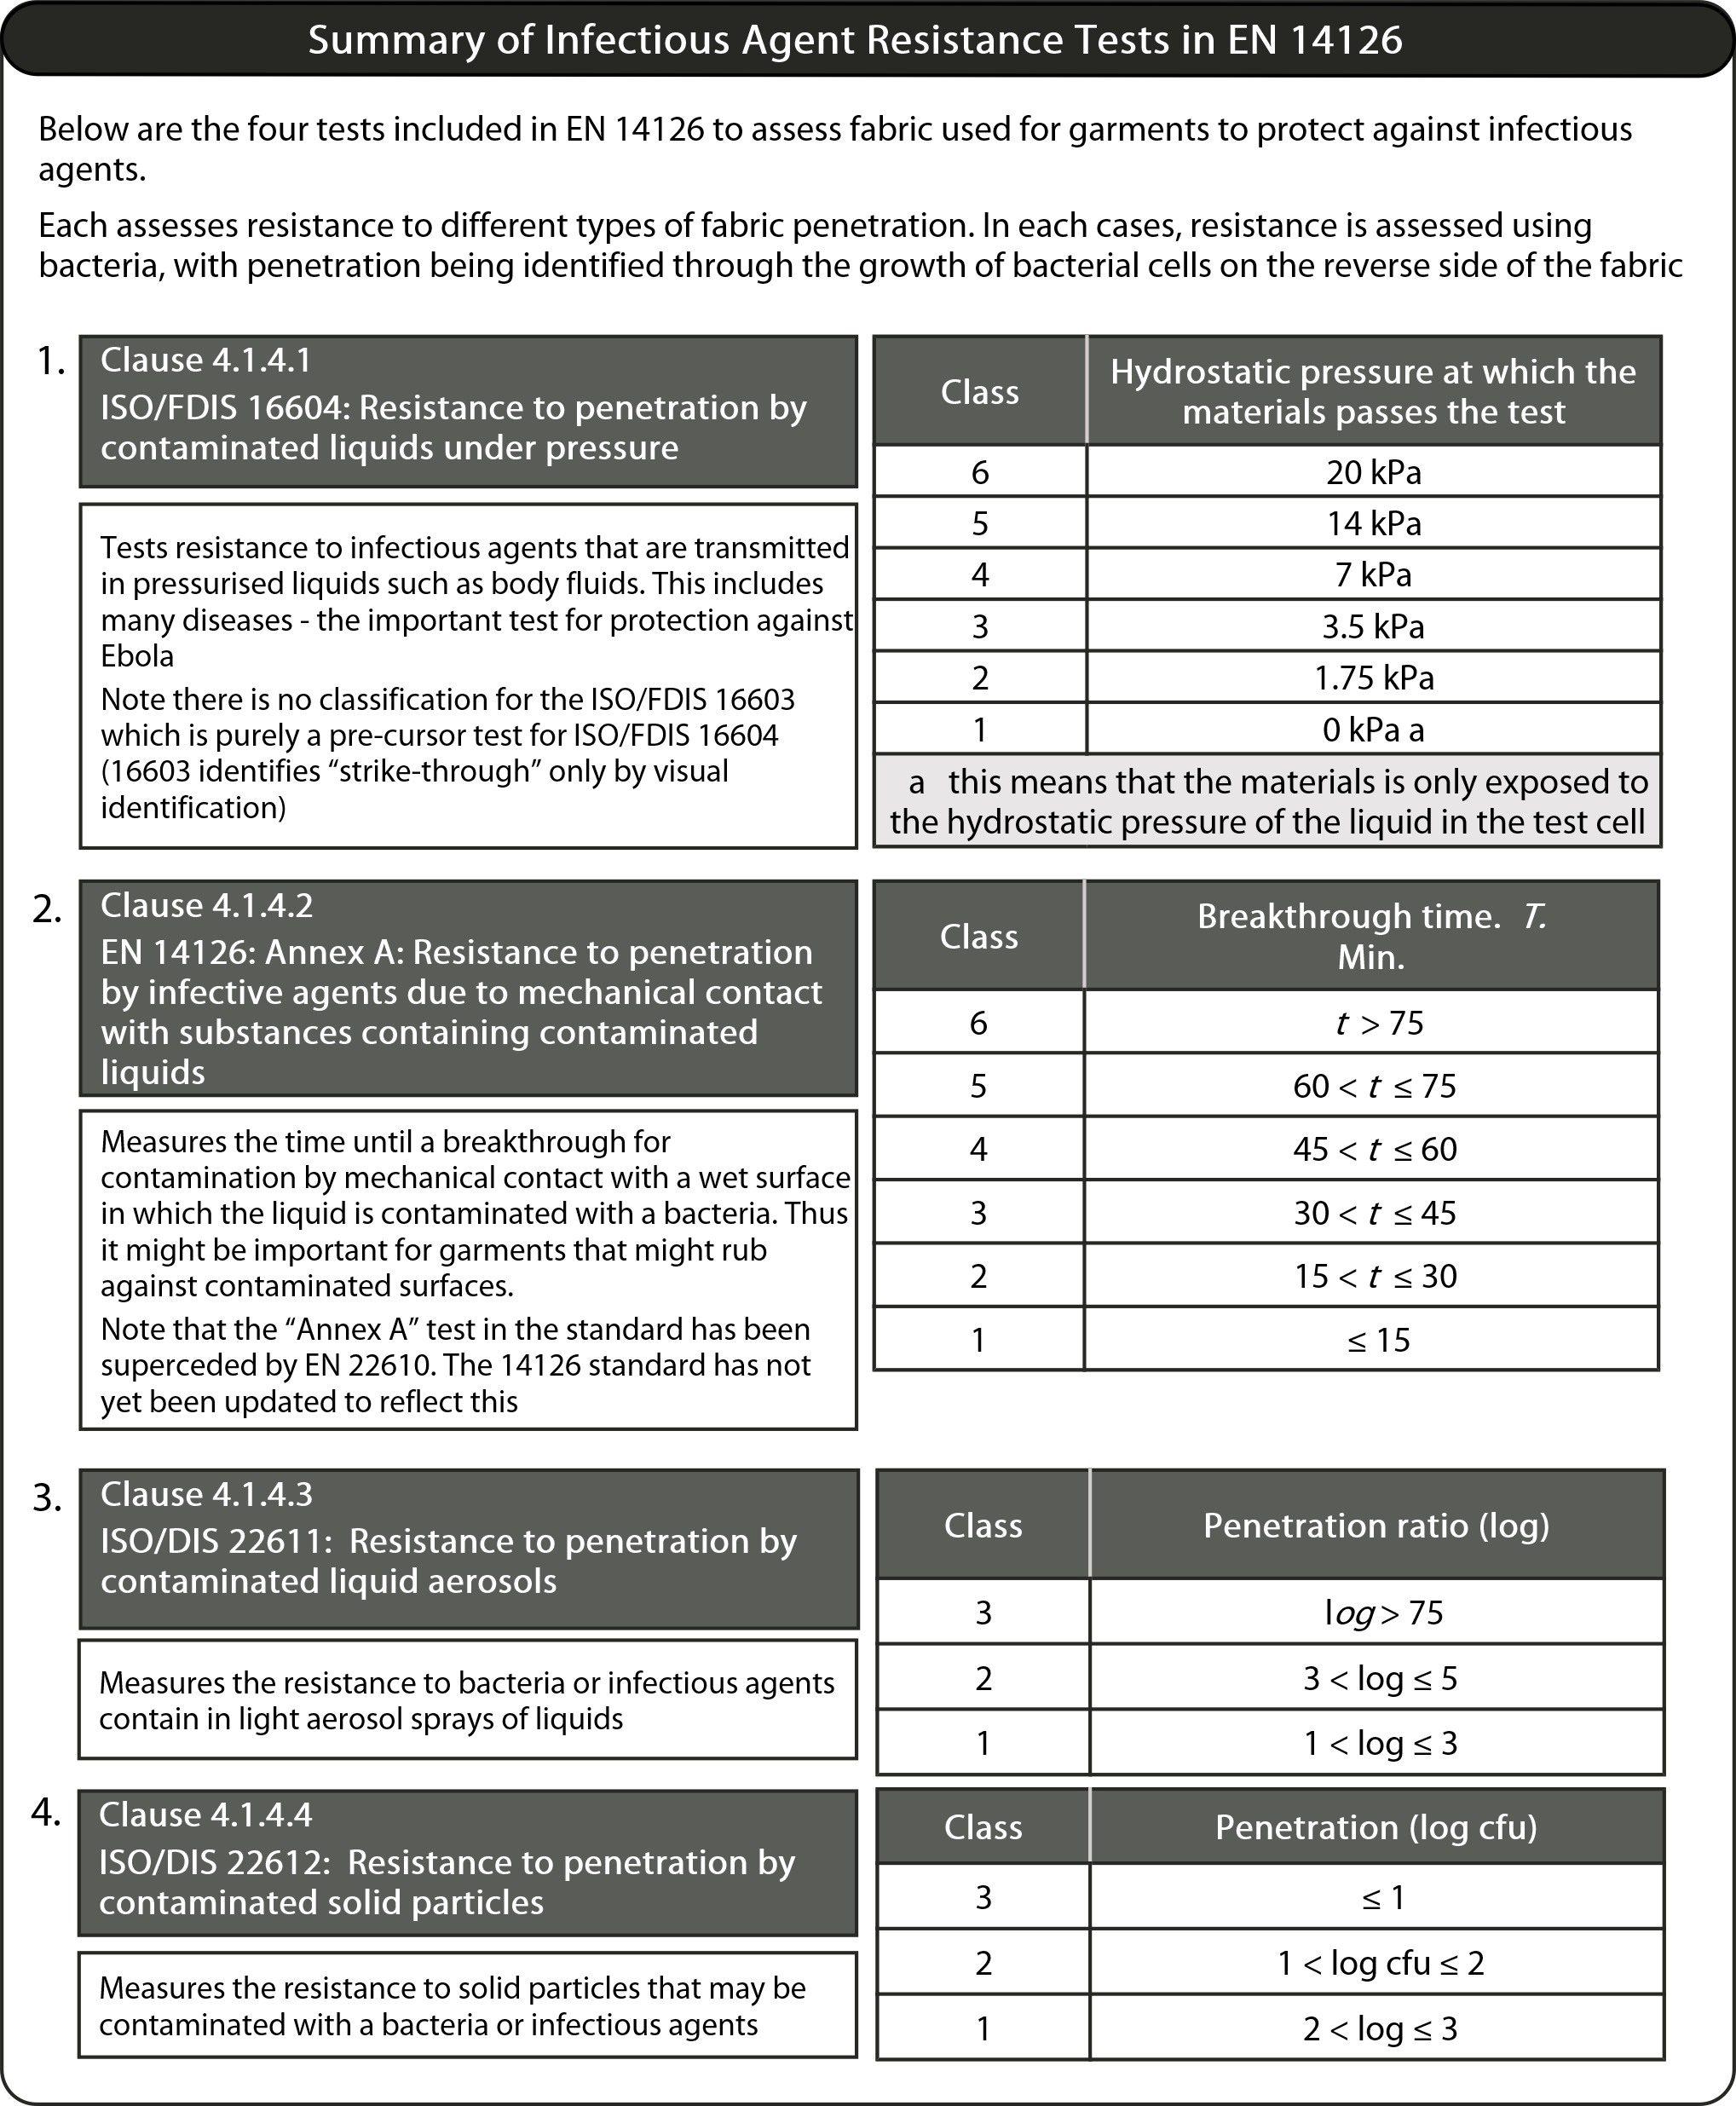 summary of en 14126 classifications